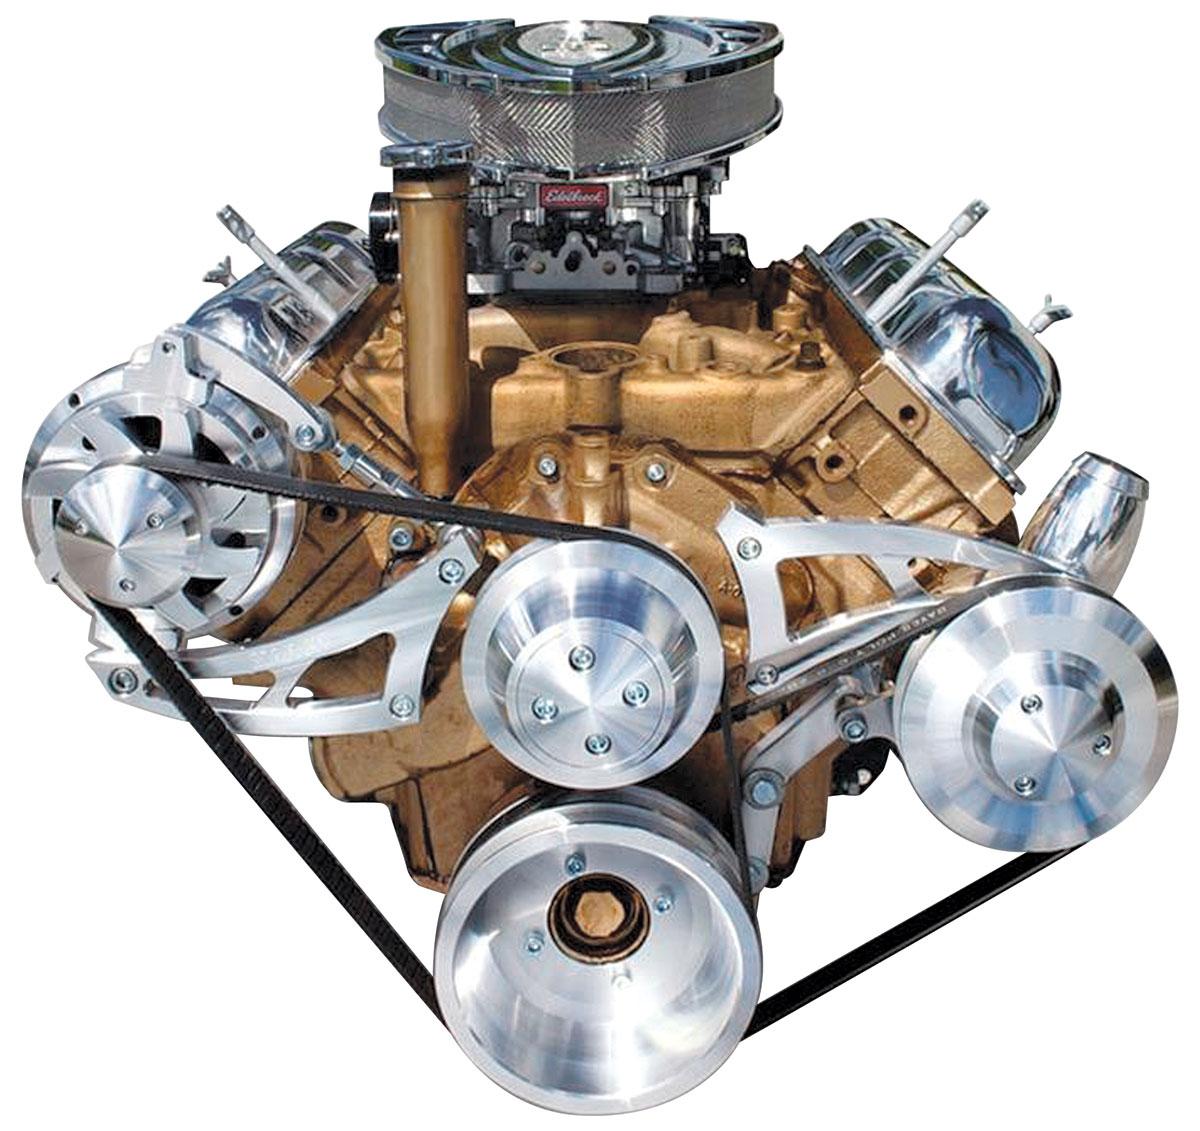 March Performance Cutlass 442 Track Serpentine Conversion